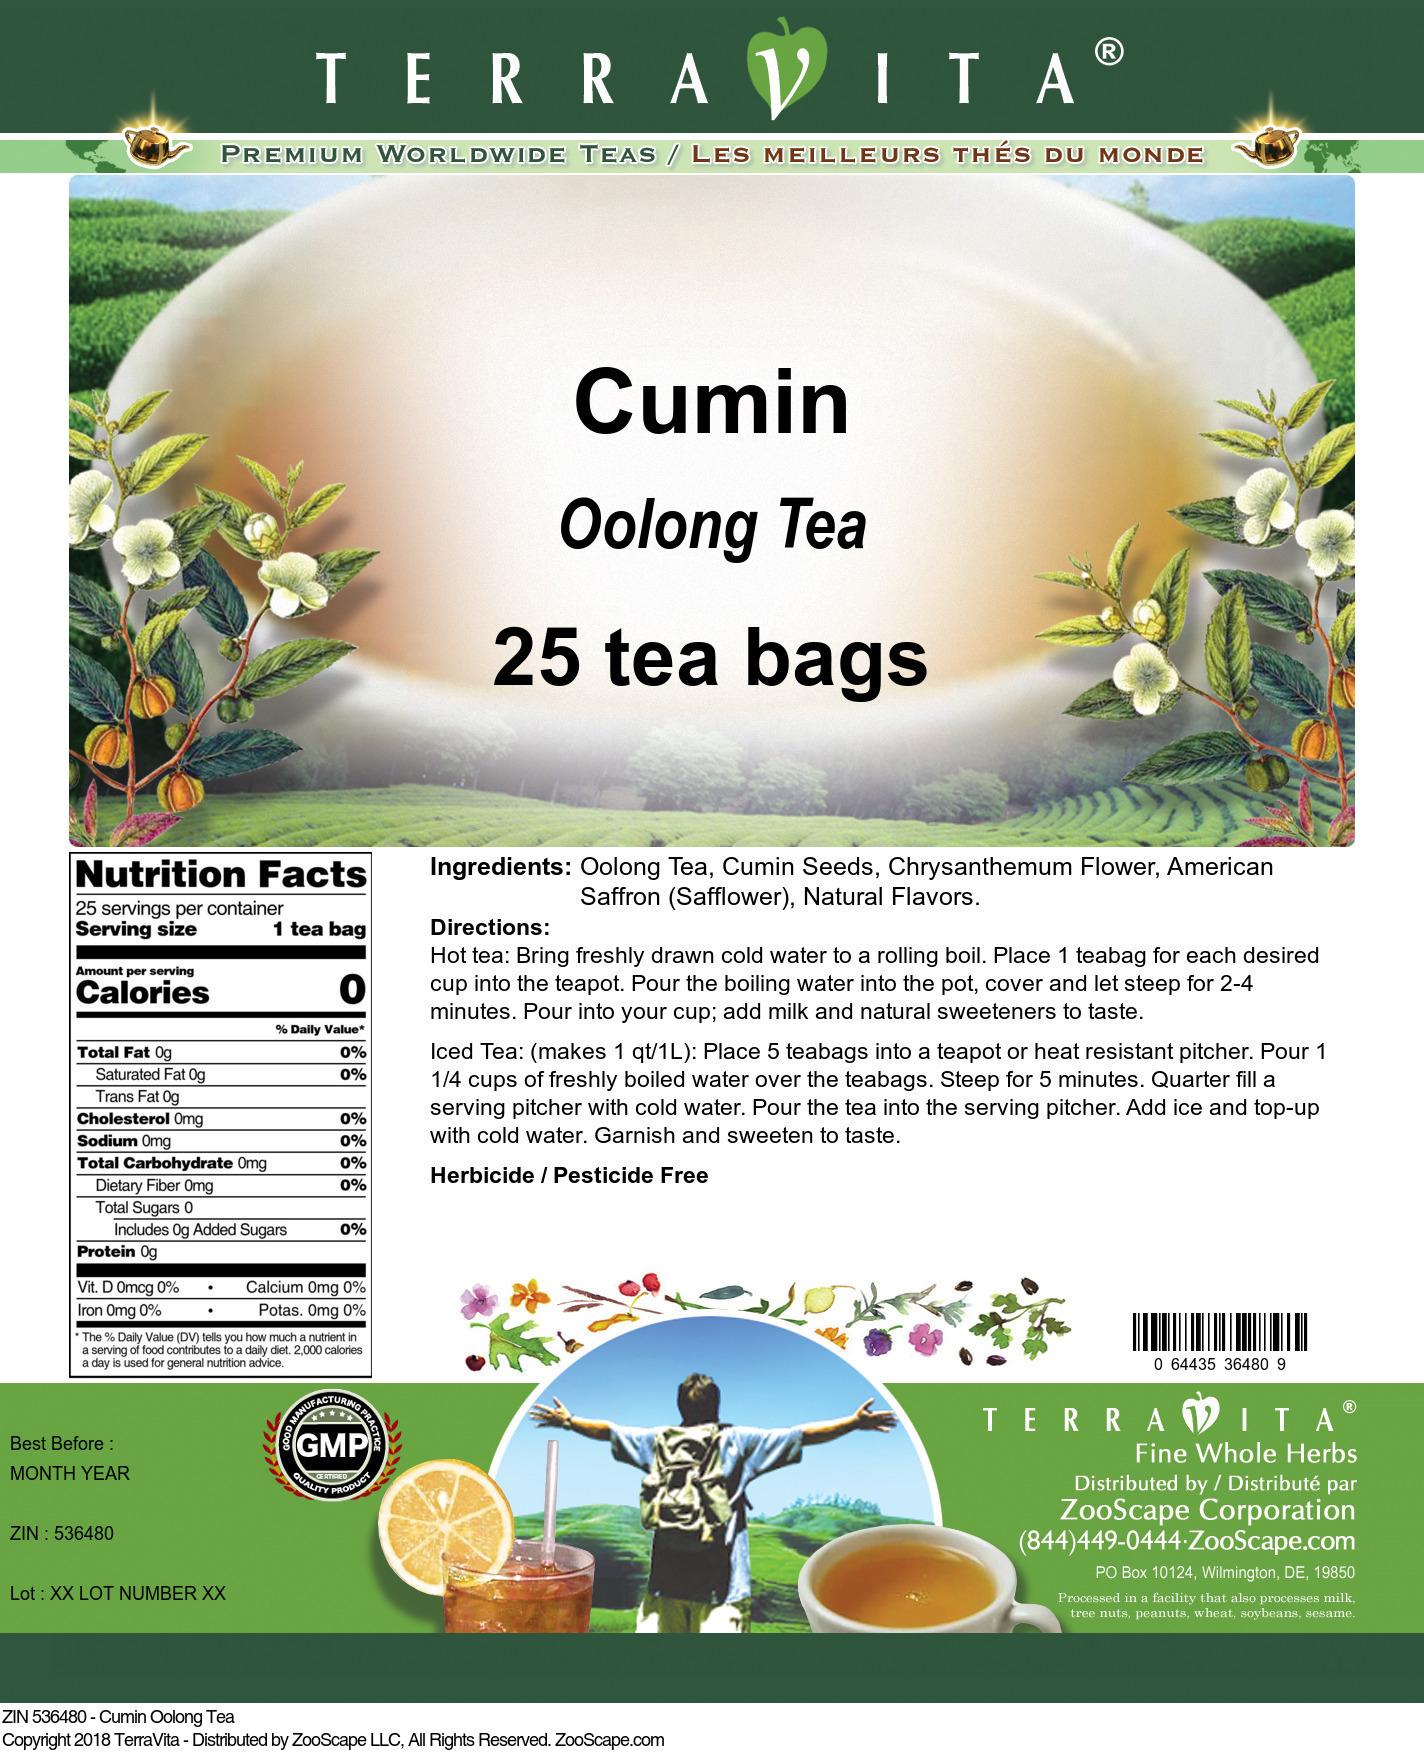 Cumin Oolong Tea